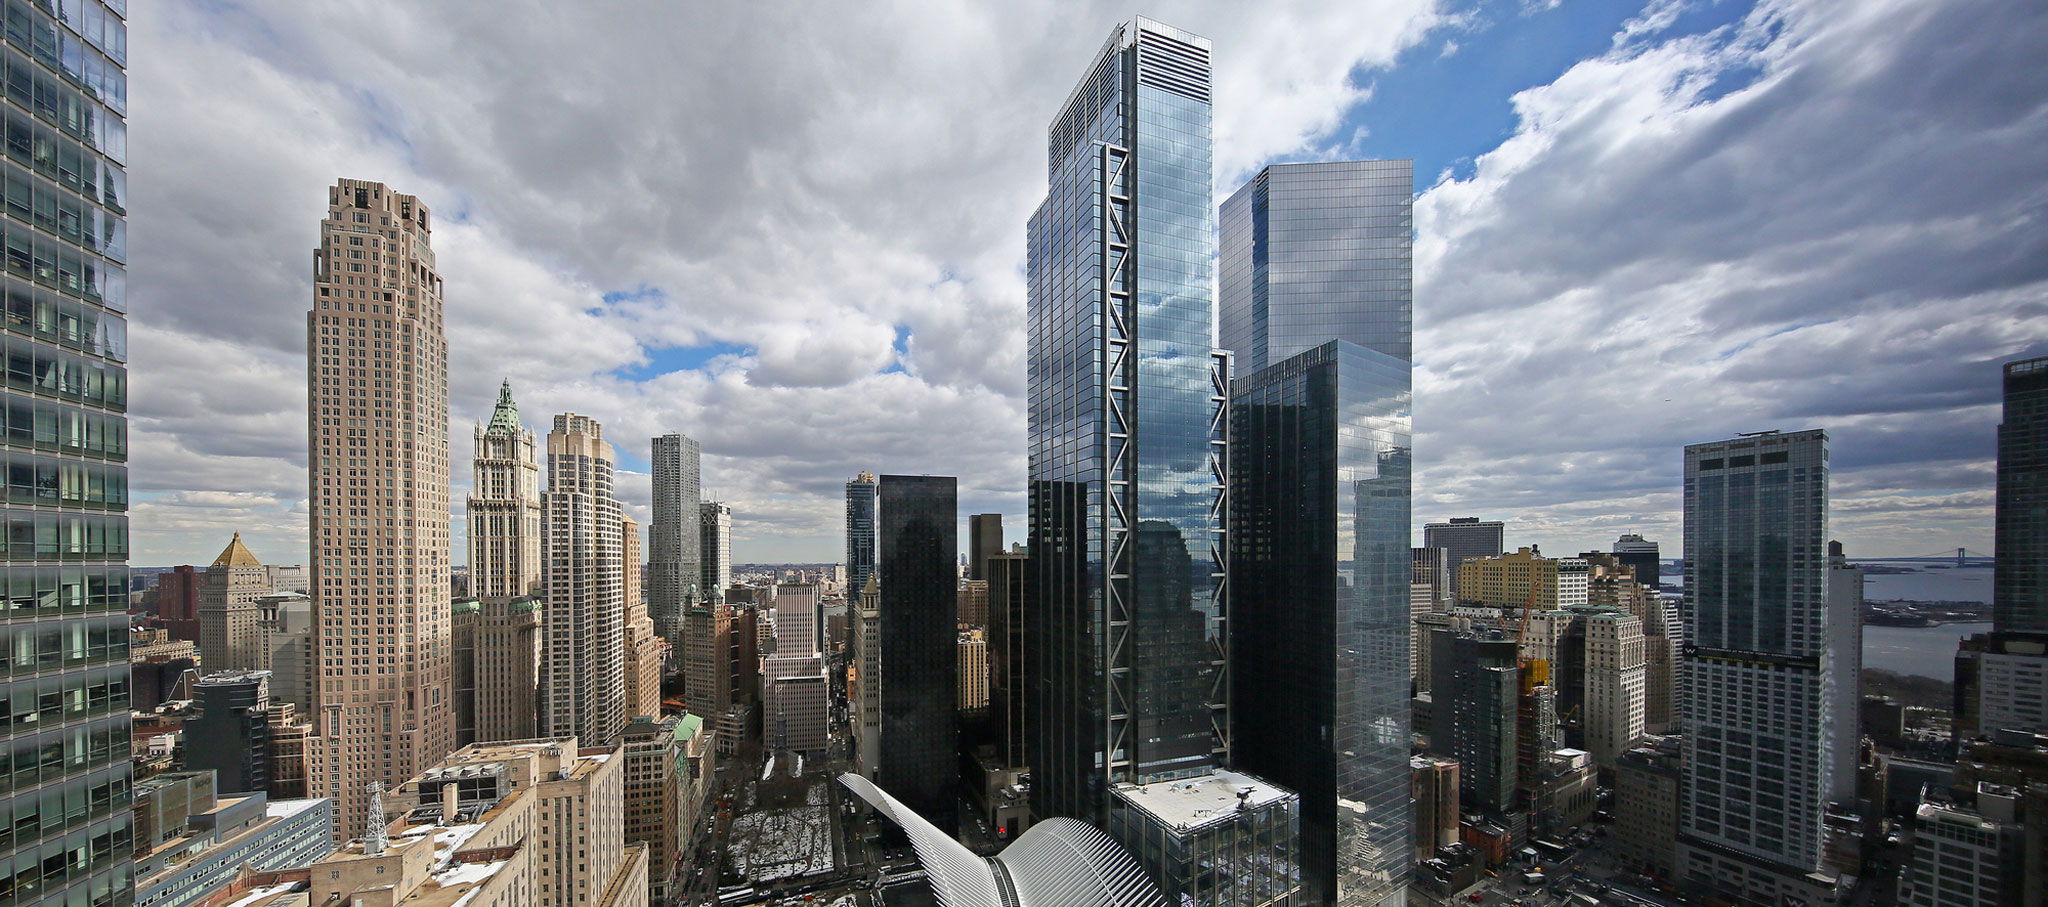 3 World Trade Center por Rogers Stirk Harbour + Partners. Imágen cortesía de World Trade Center